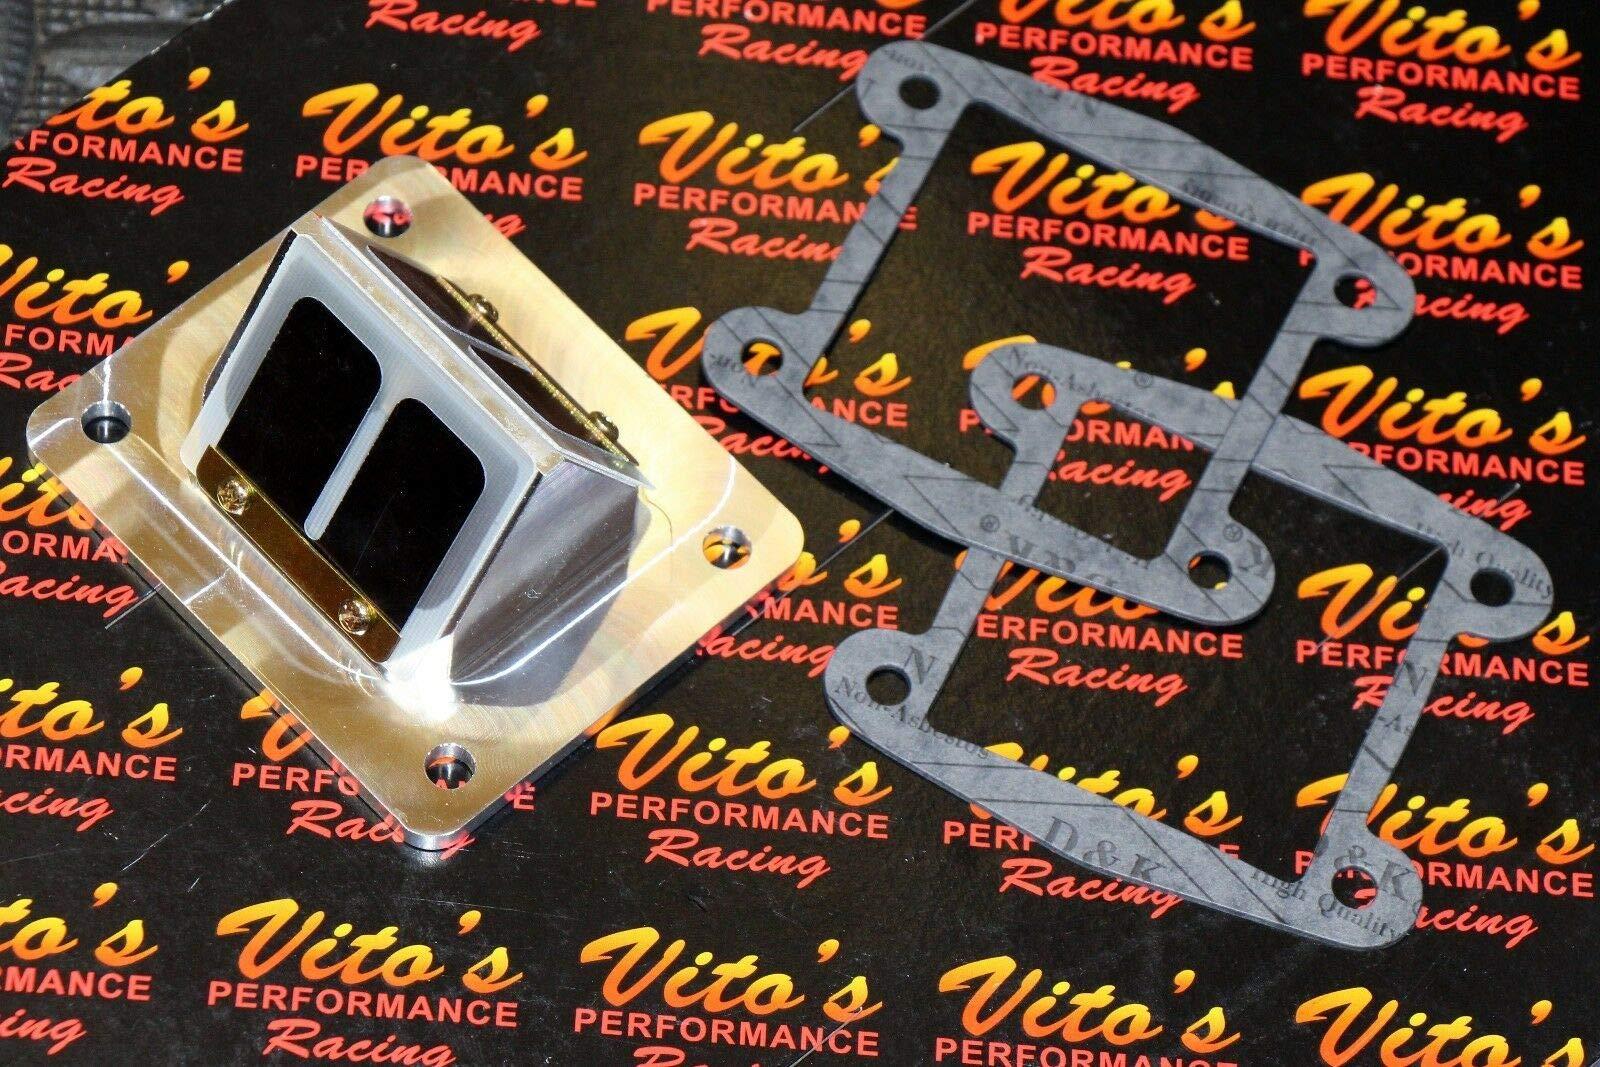 V-Force 4 Reed Valve System For 1989 Yamaha YFS200 Blaster~Moto Tassinari V4145